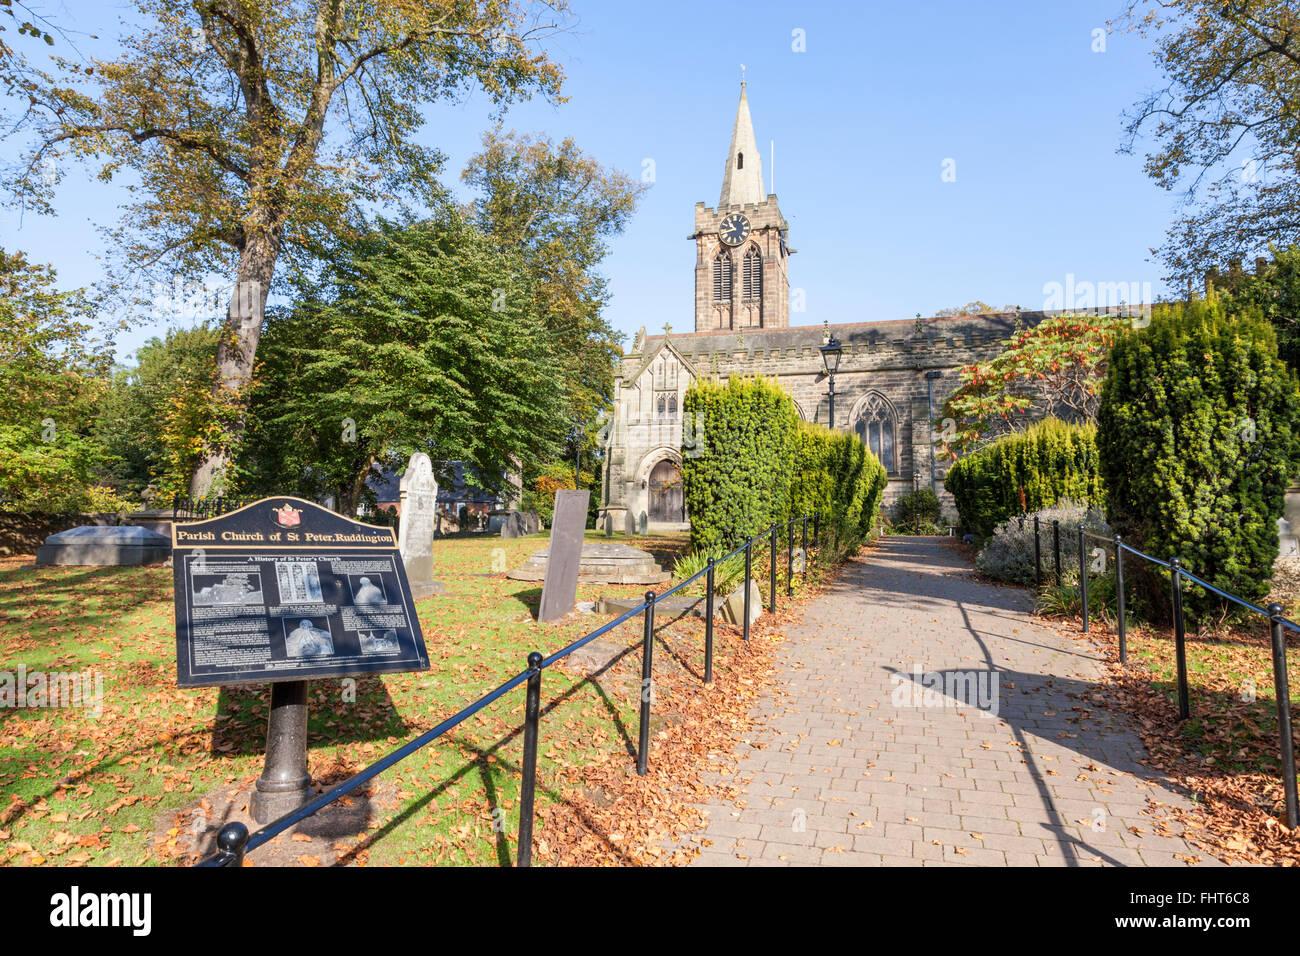 St Peter's Church, Ruddington, Nottinghamshire, England, UK - Stock Image